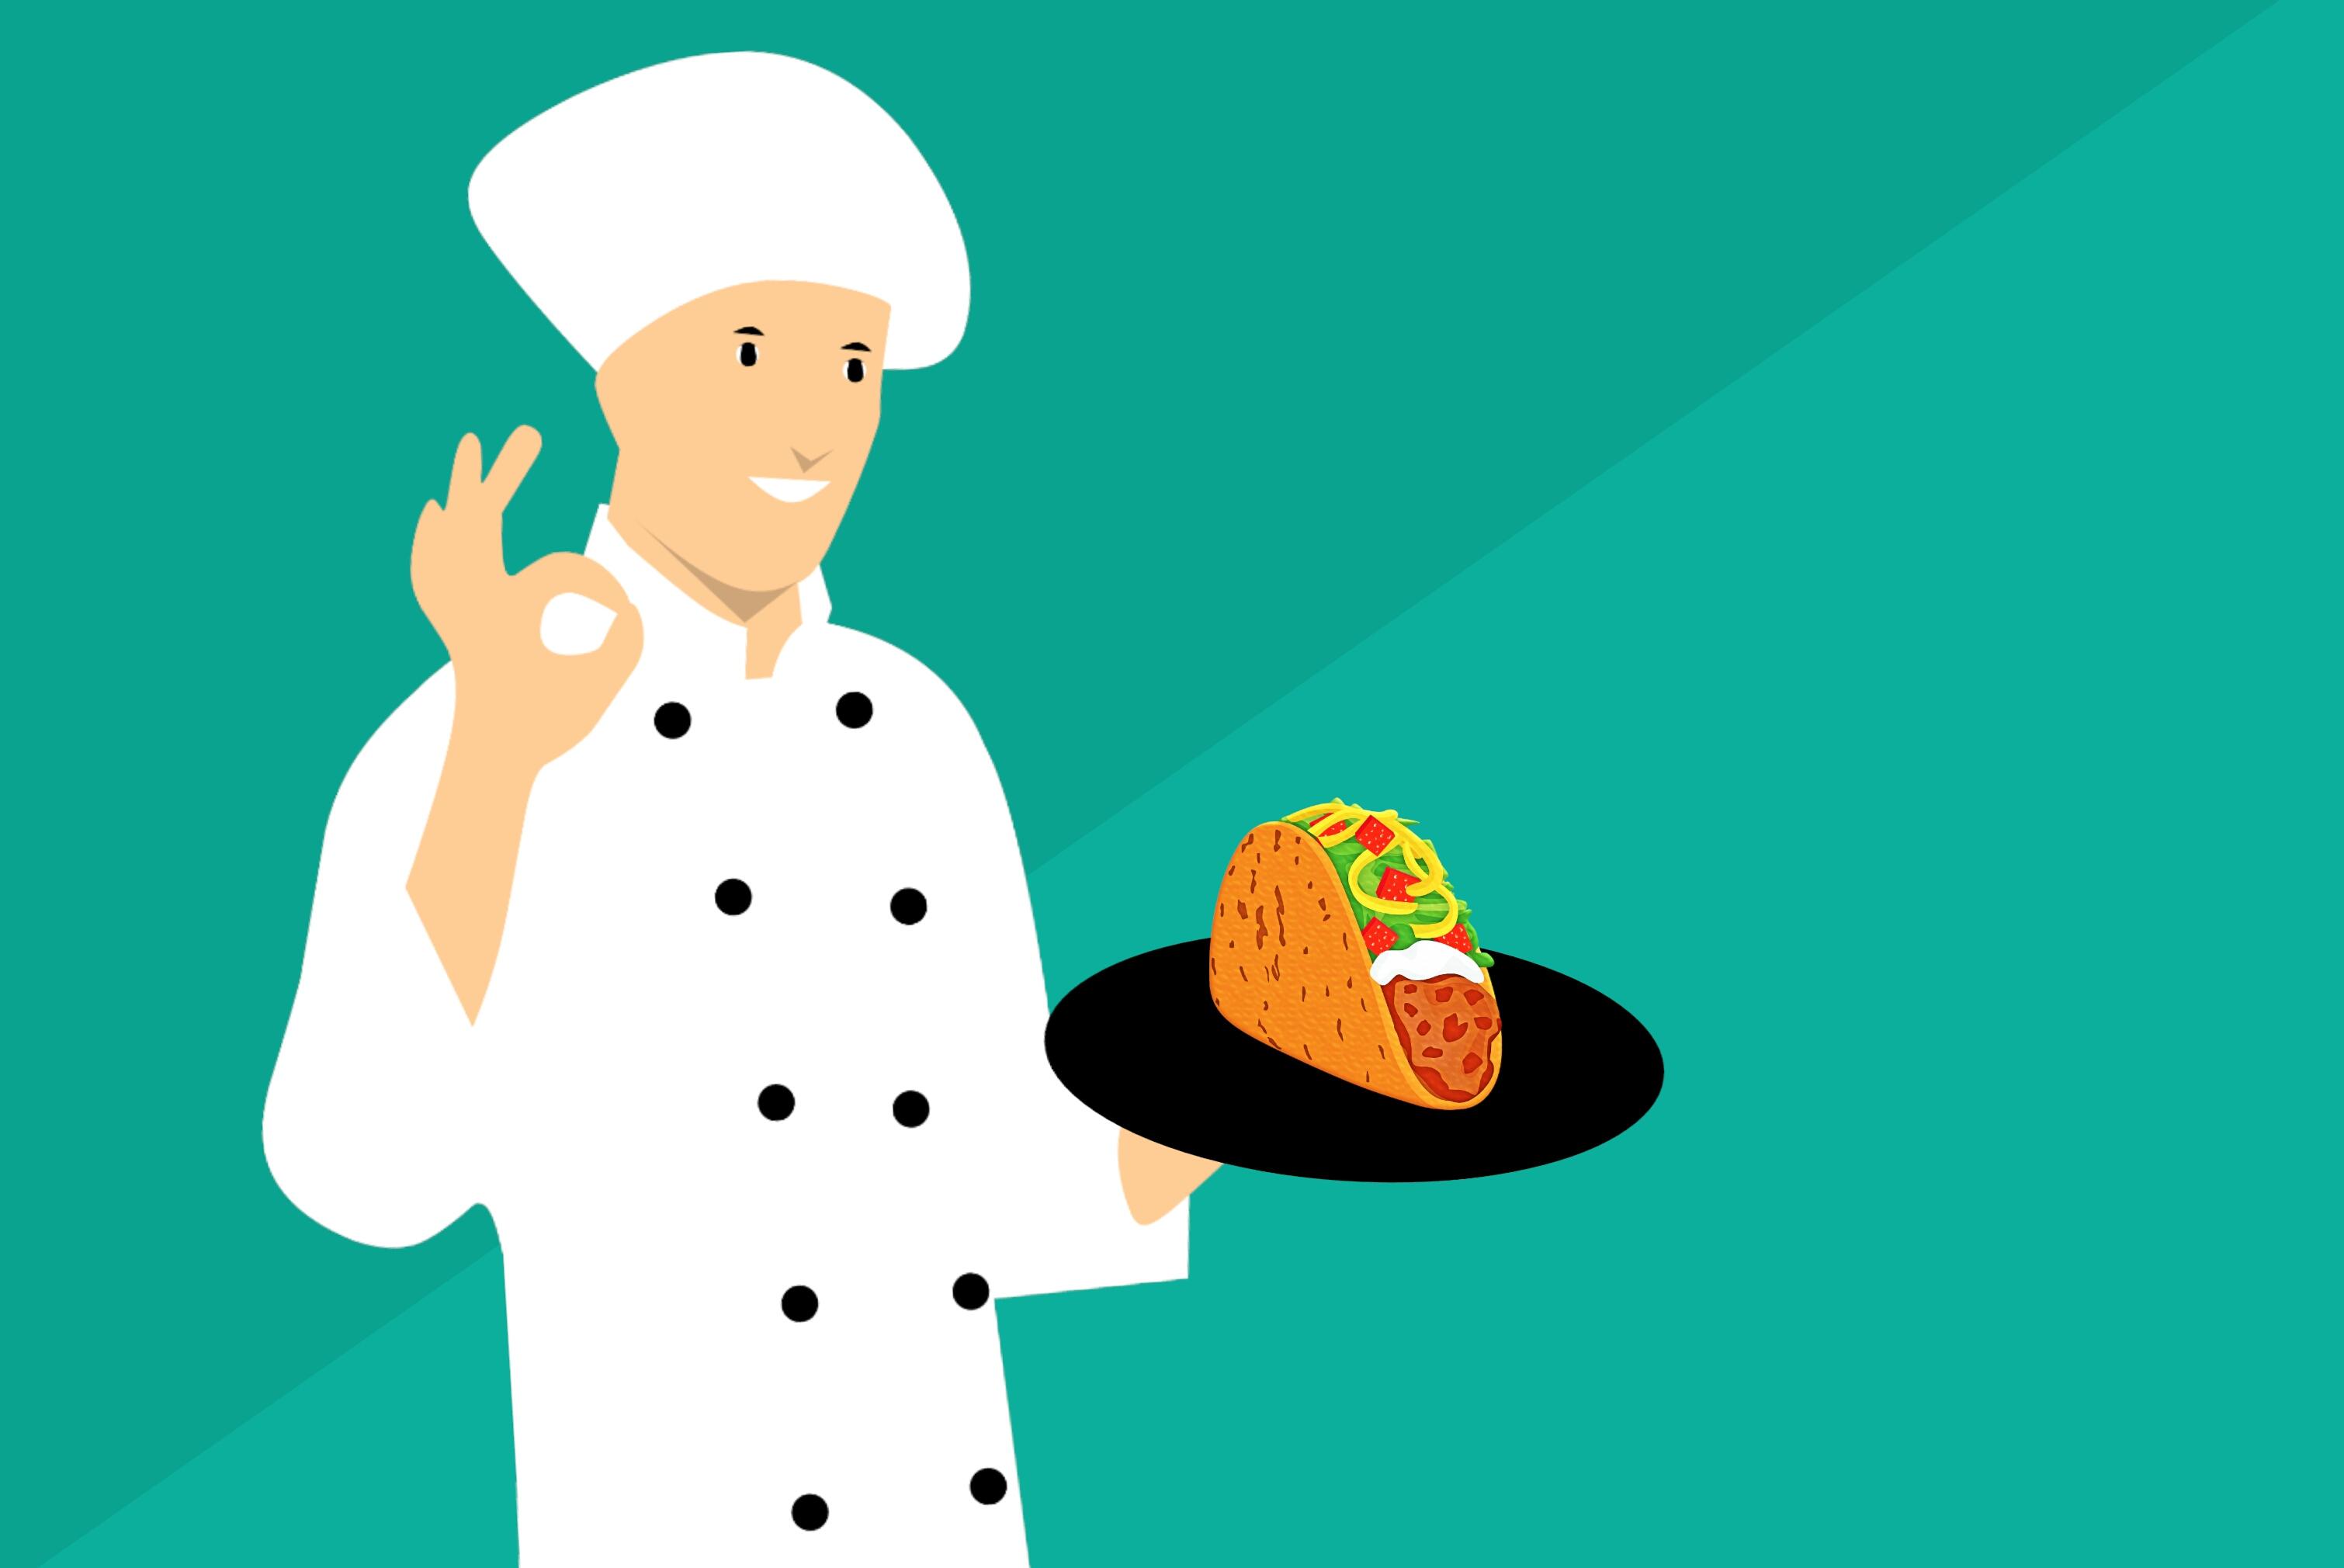 Gambar Taco Koki Gambar Kartun Dapur Meksiko Sombrero